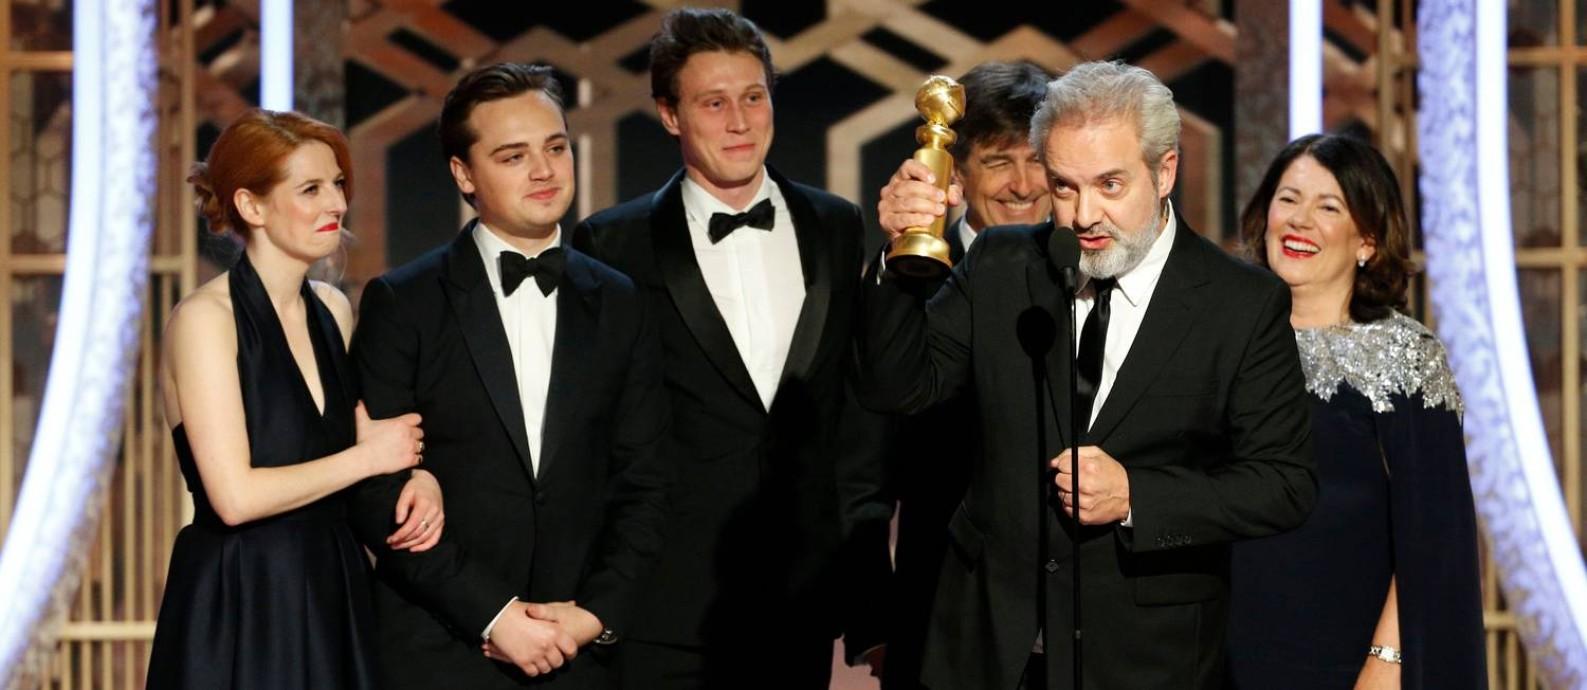 Globo de Ouro 2020: A lista completa de vencedores - Jornal O Globo